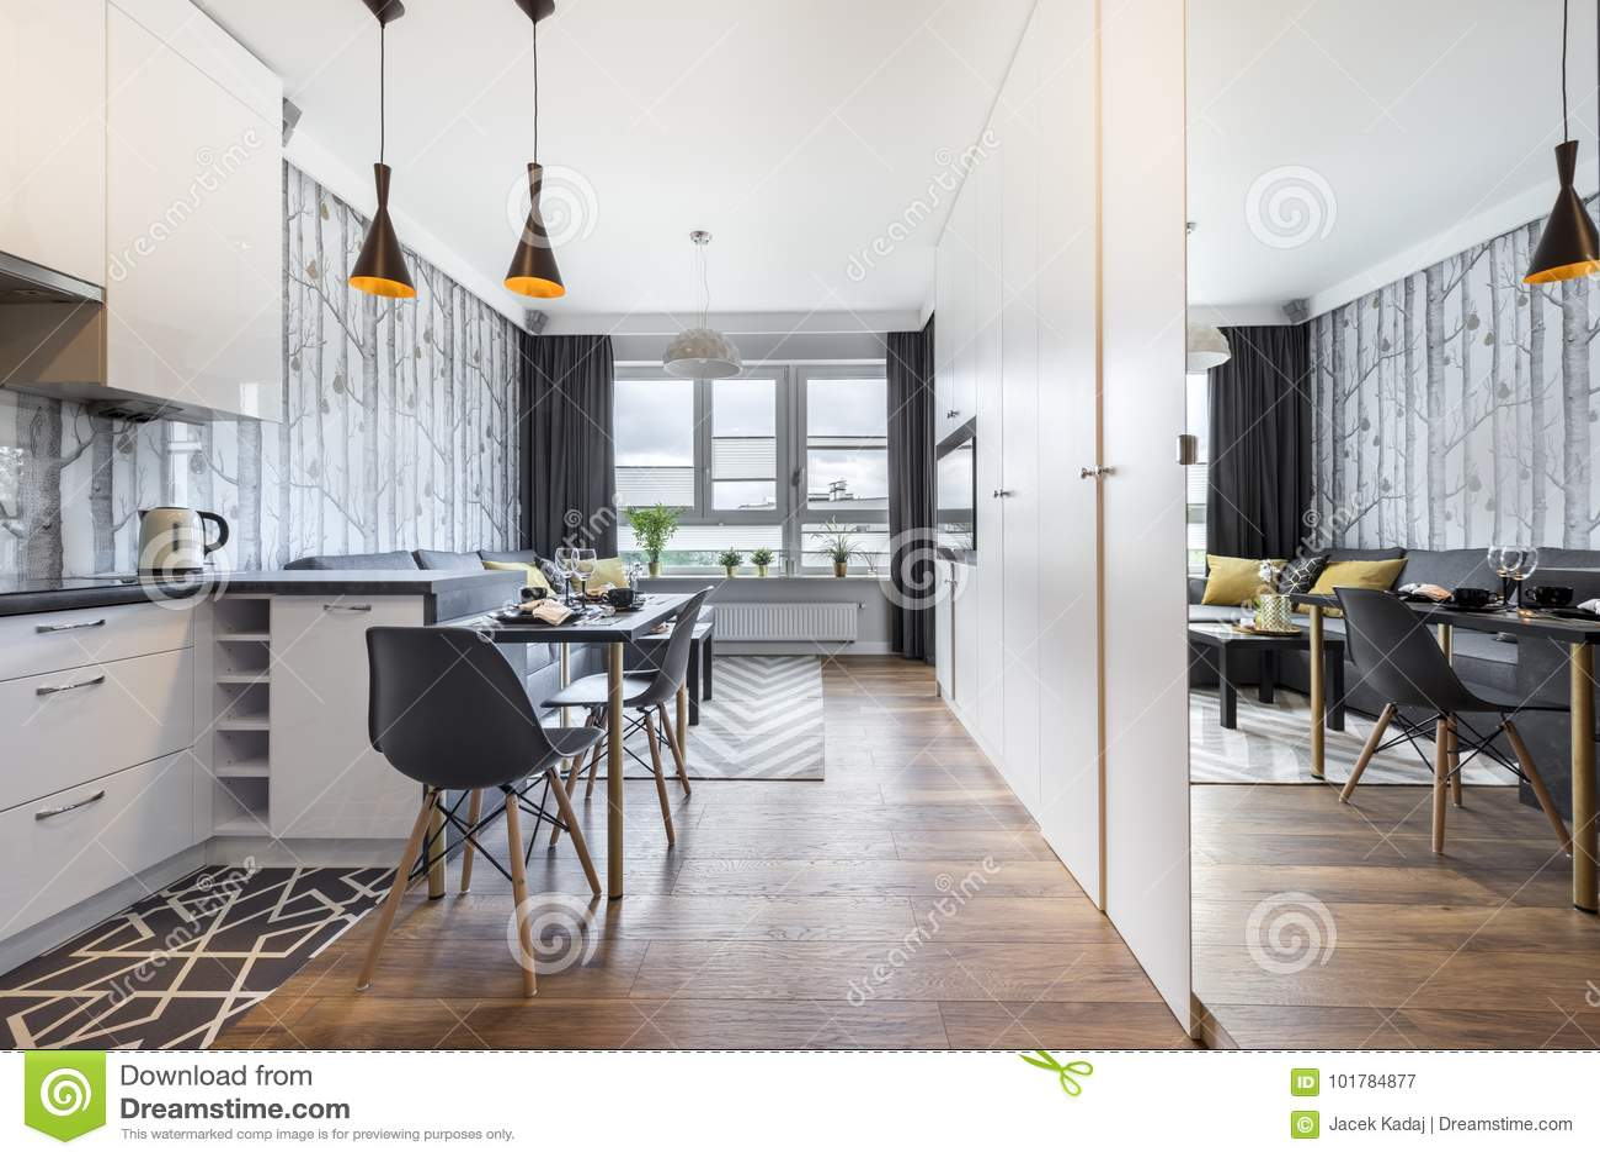 Keuken Kleine Ruimte : Kleine luxe keukens kleine woonkamer eigentijdse ikea keuken